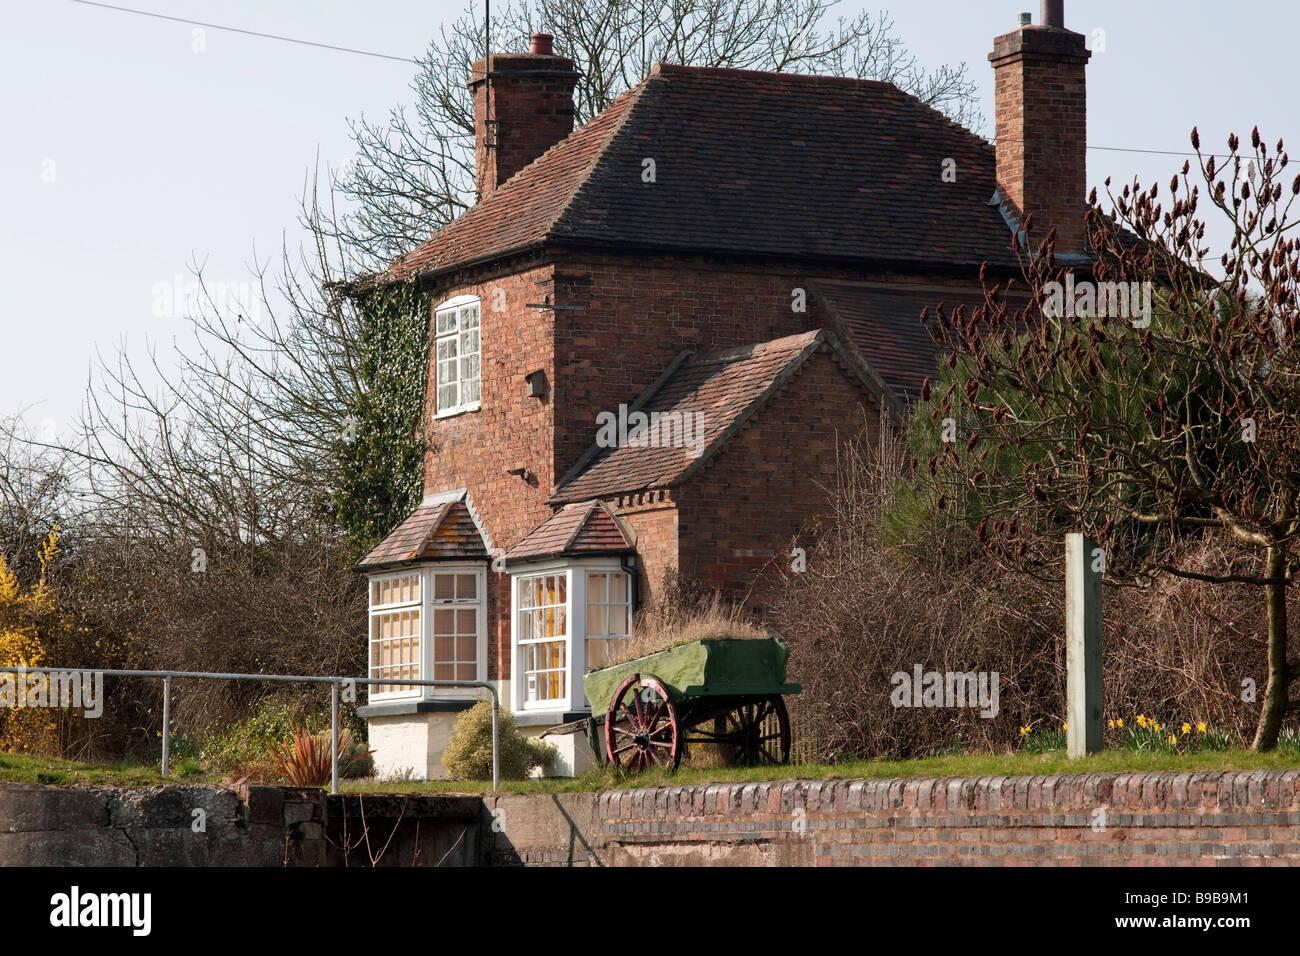 grand union canal hatton flight of locks warwickshire midlands england uk lock keepers cottage - Stock Image